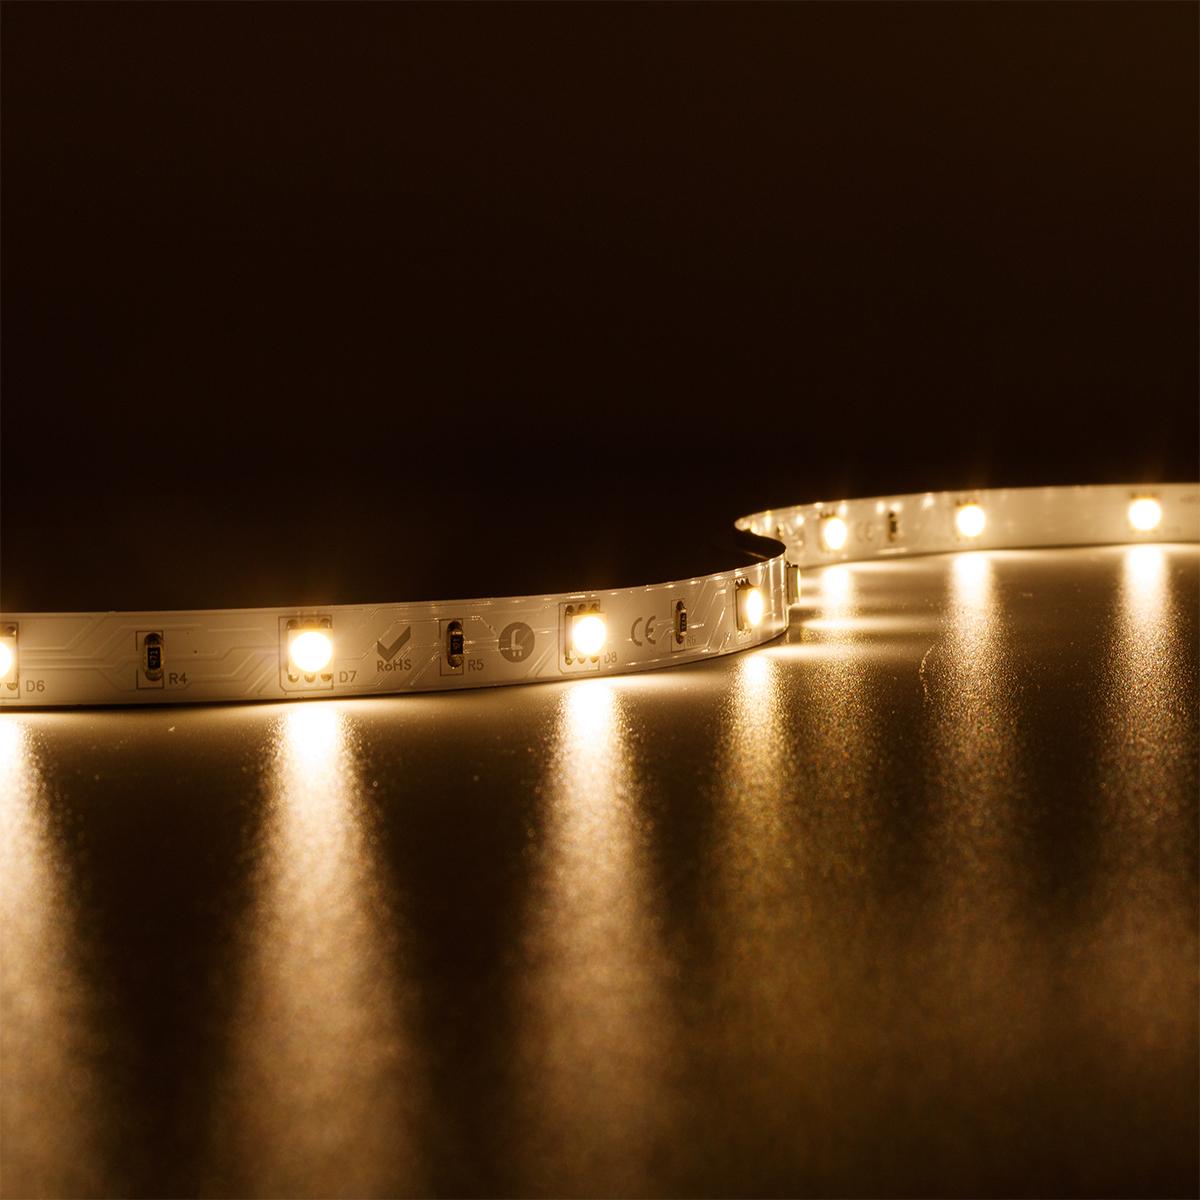 Strip Warmweiß 24V LED Streifen 5M 7,2W/m 30LED/m 10mm IP20 3000K